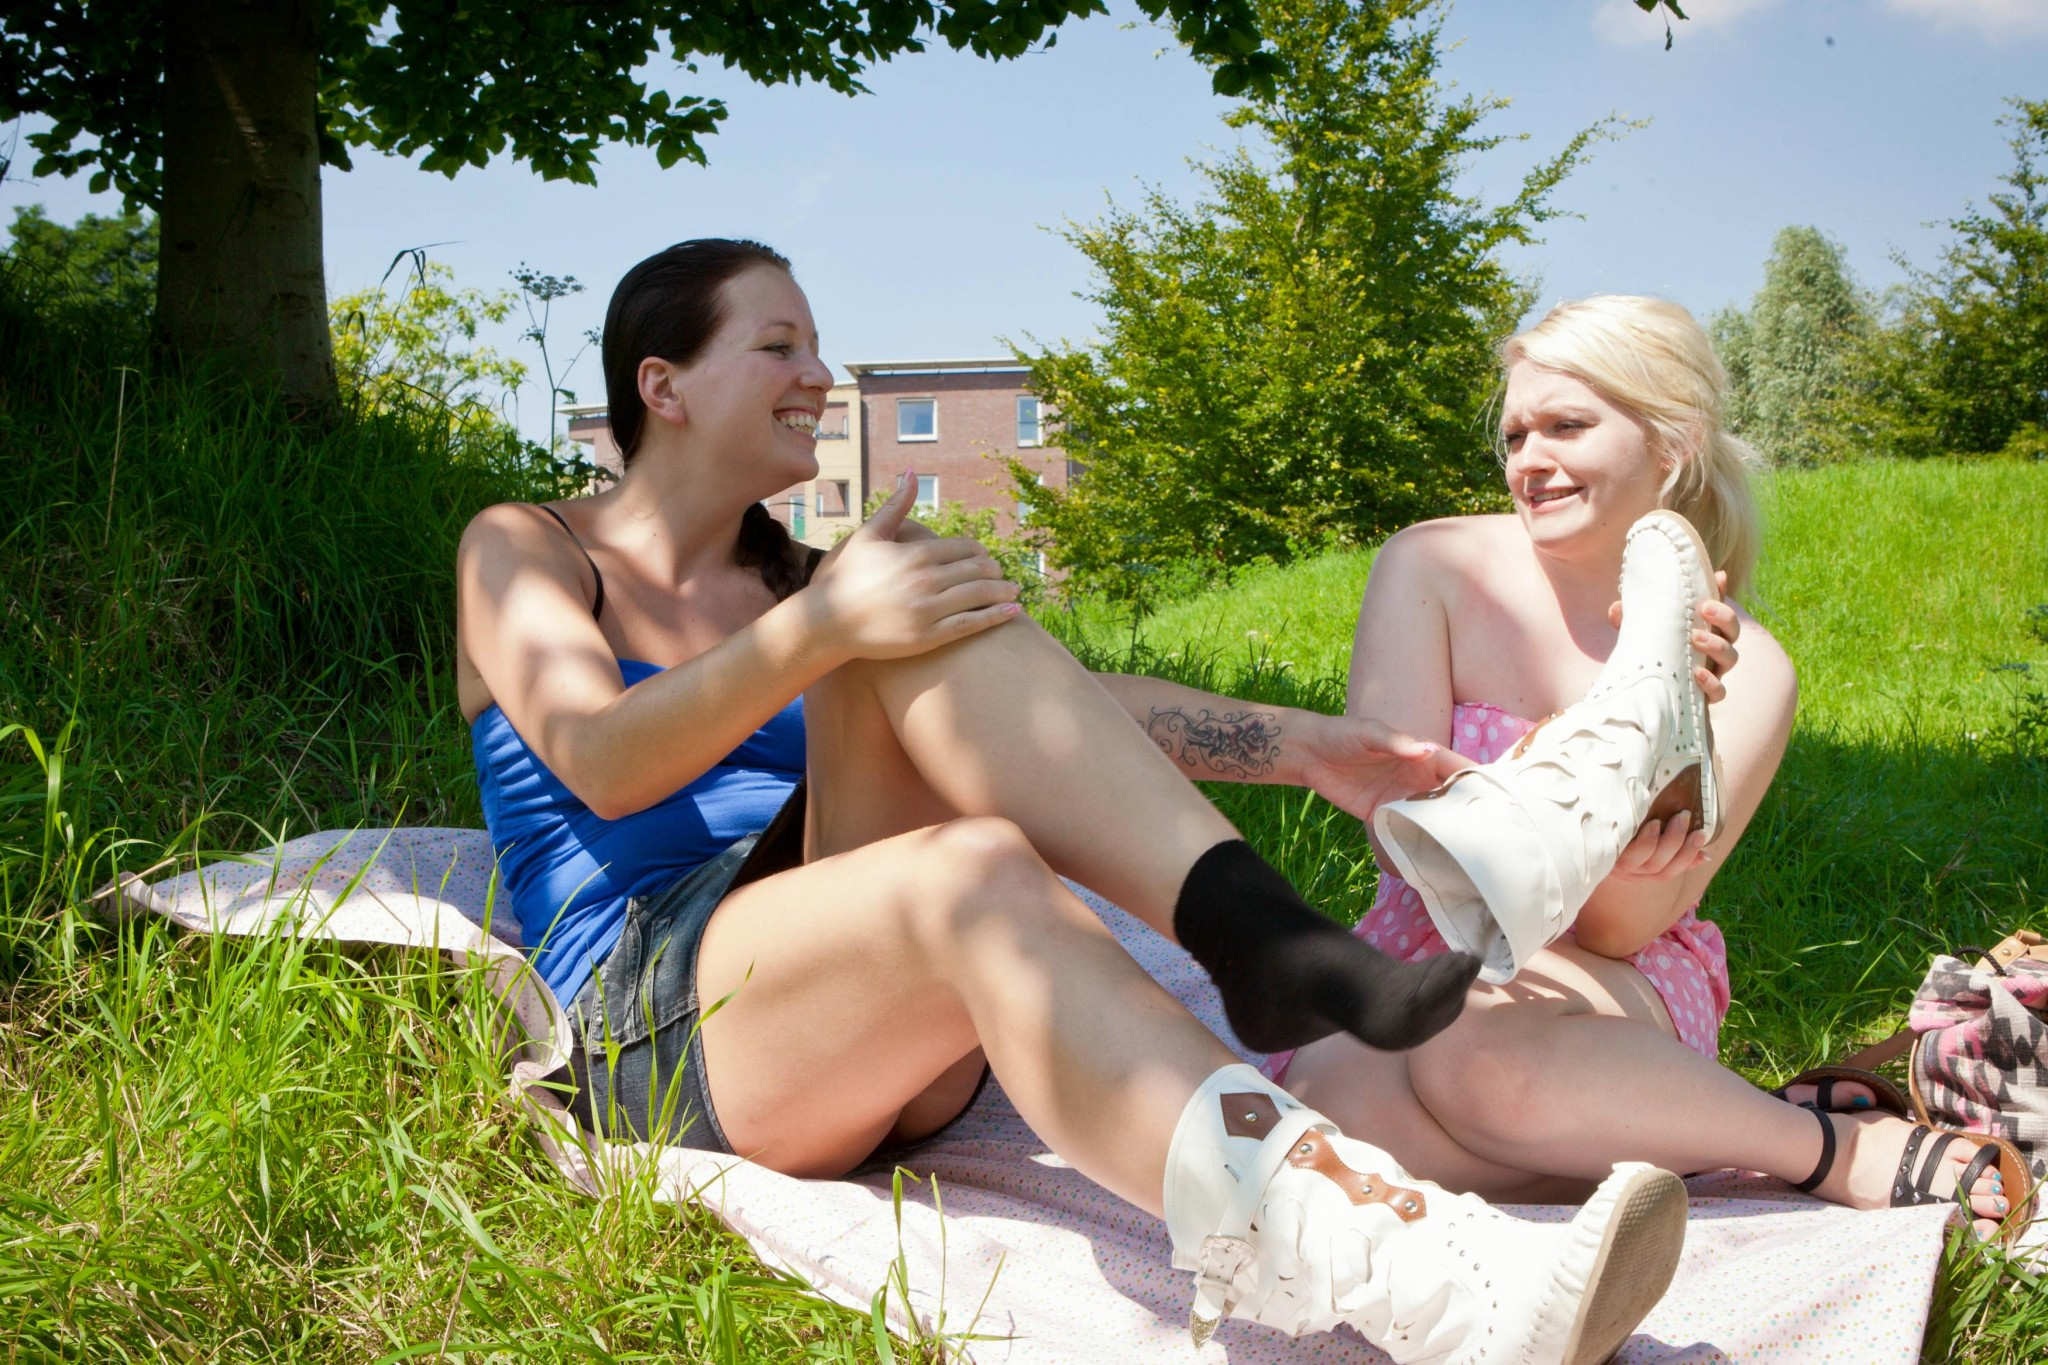 Naked girls outdoors lesbian sex